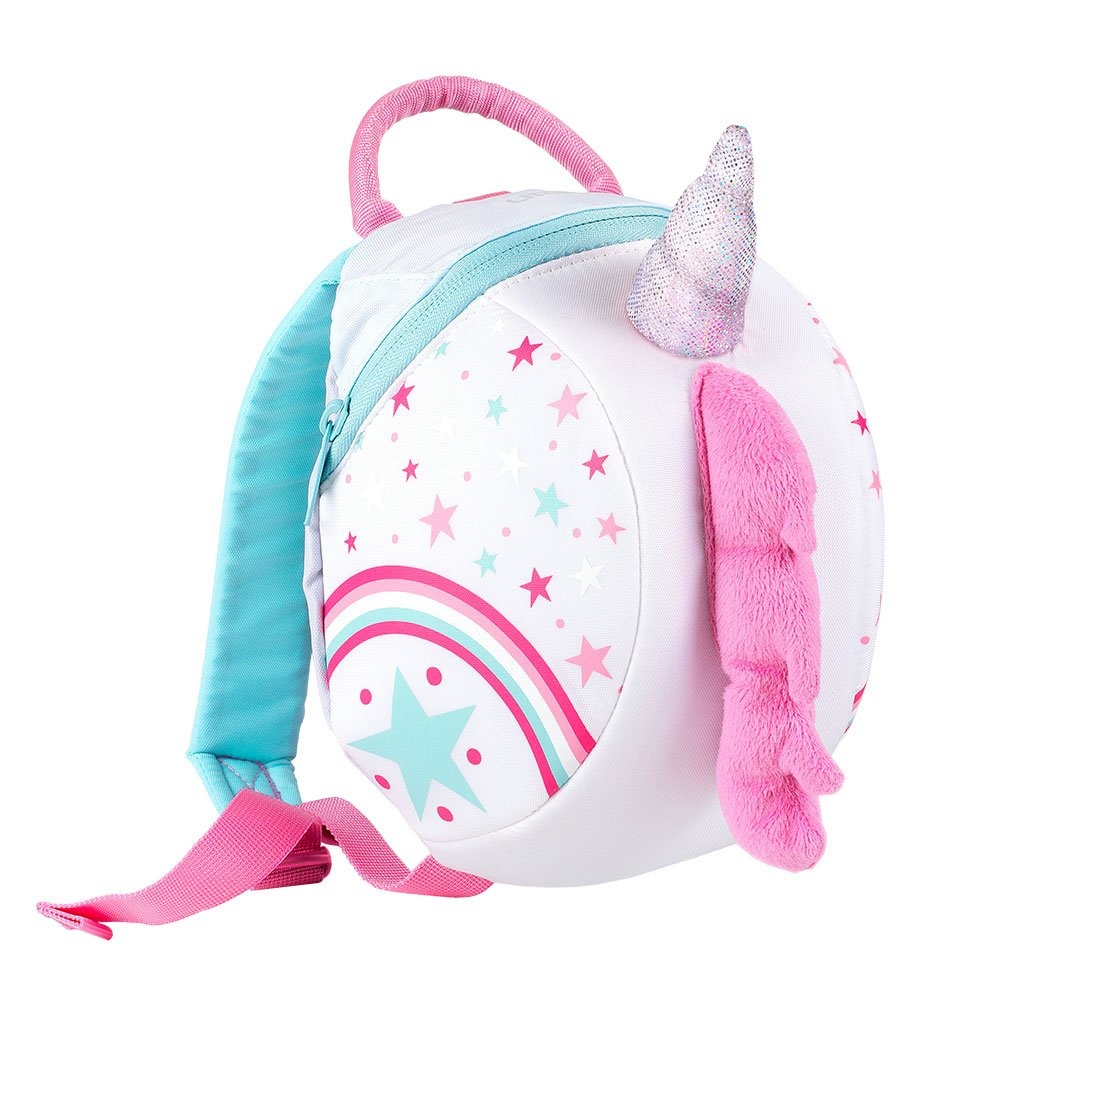 Toddler Girl Unicorn Backpack - CEAGESP